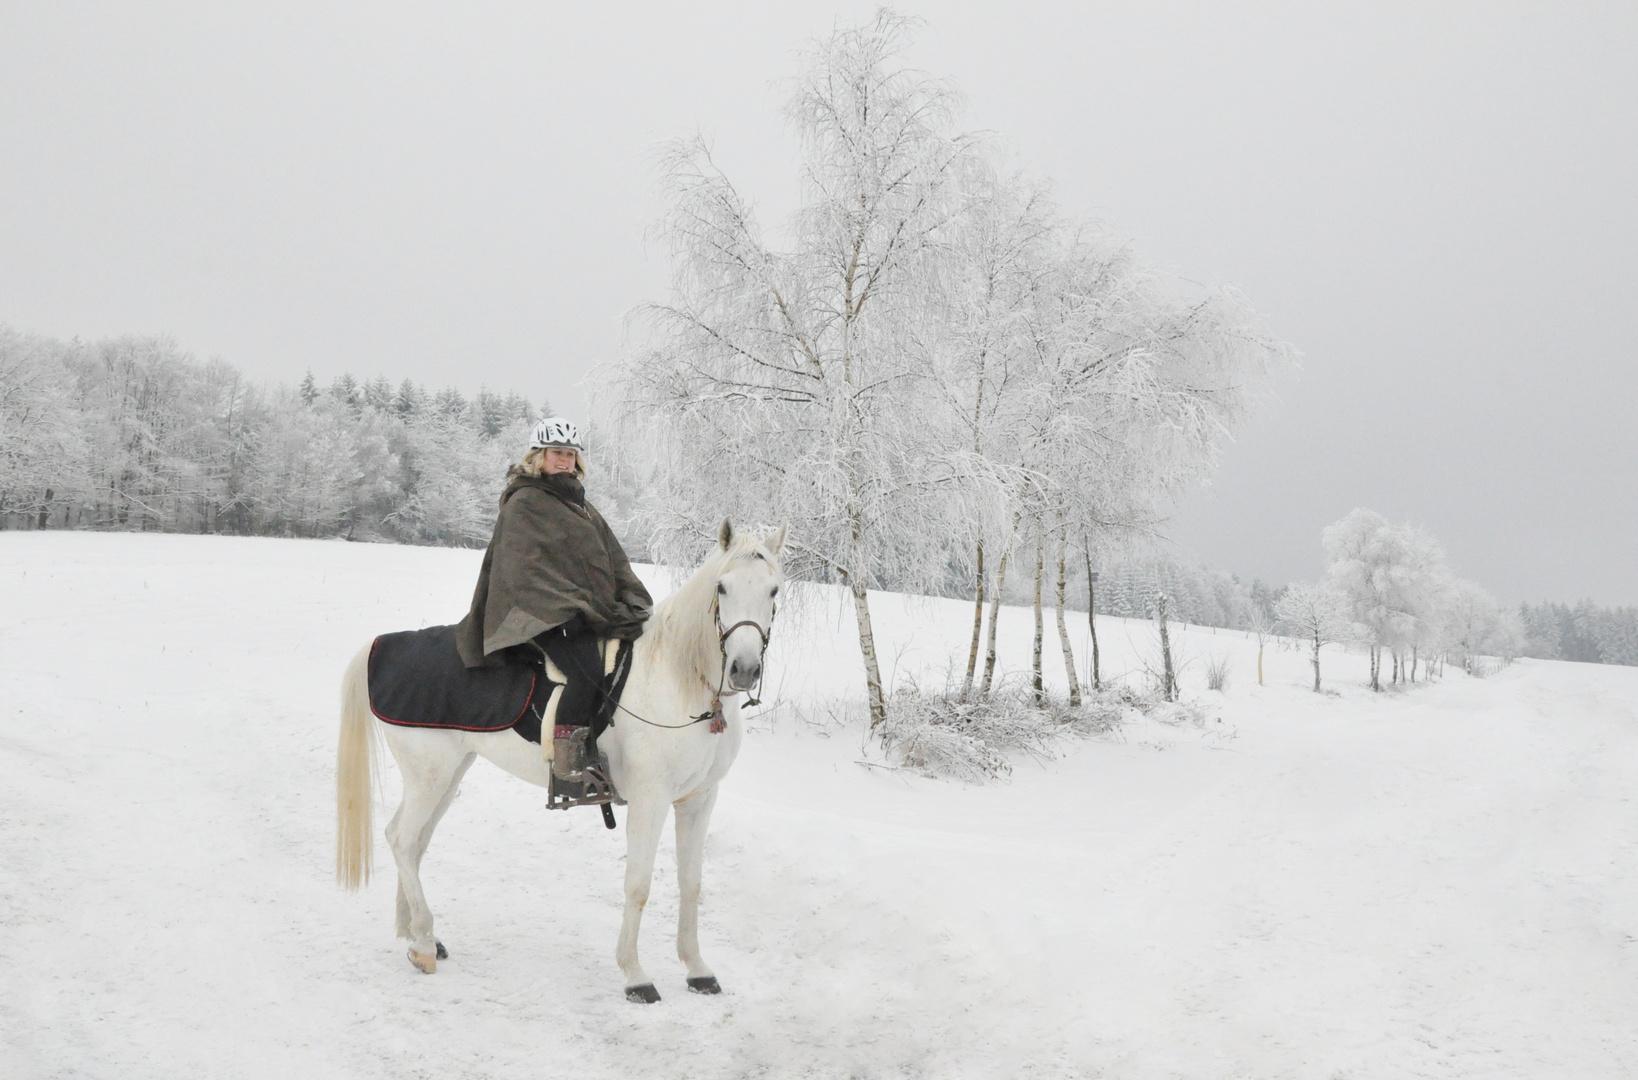 Winterlandschaft 02: Pferd & Reiterin